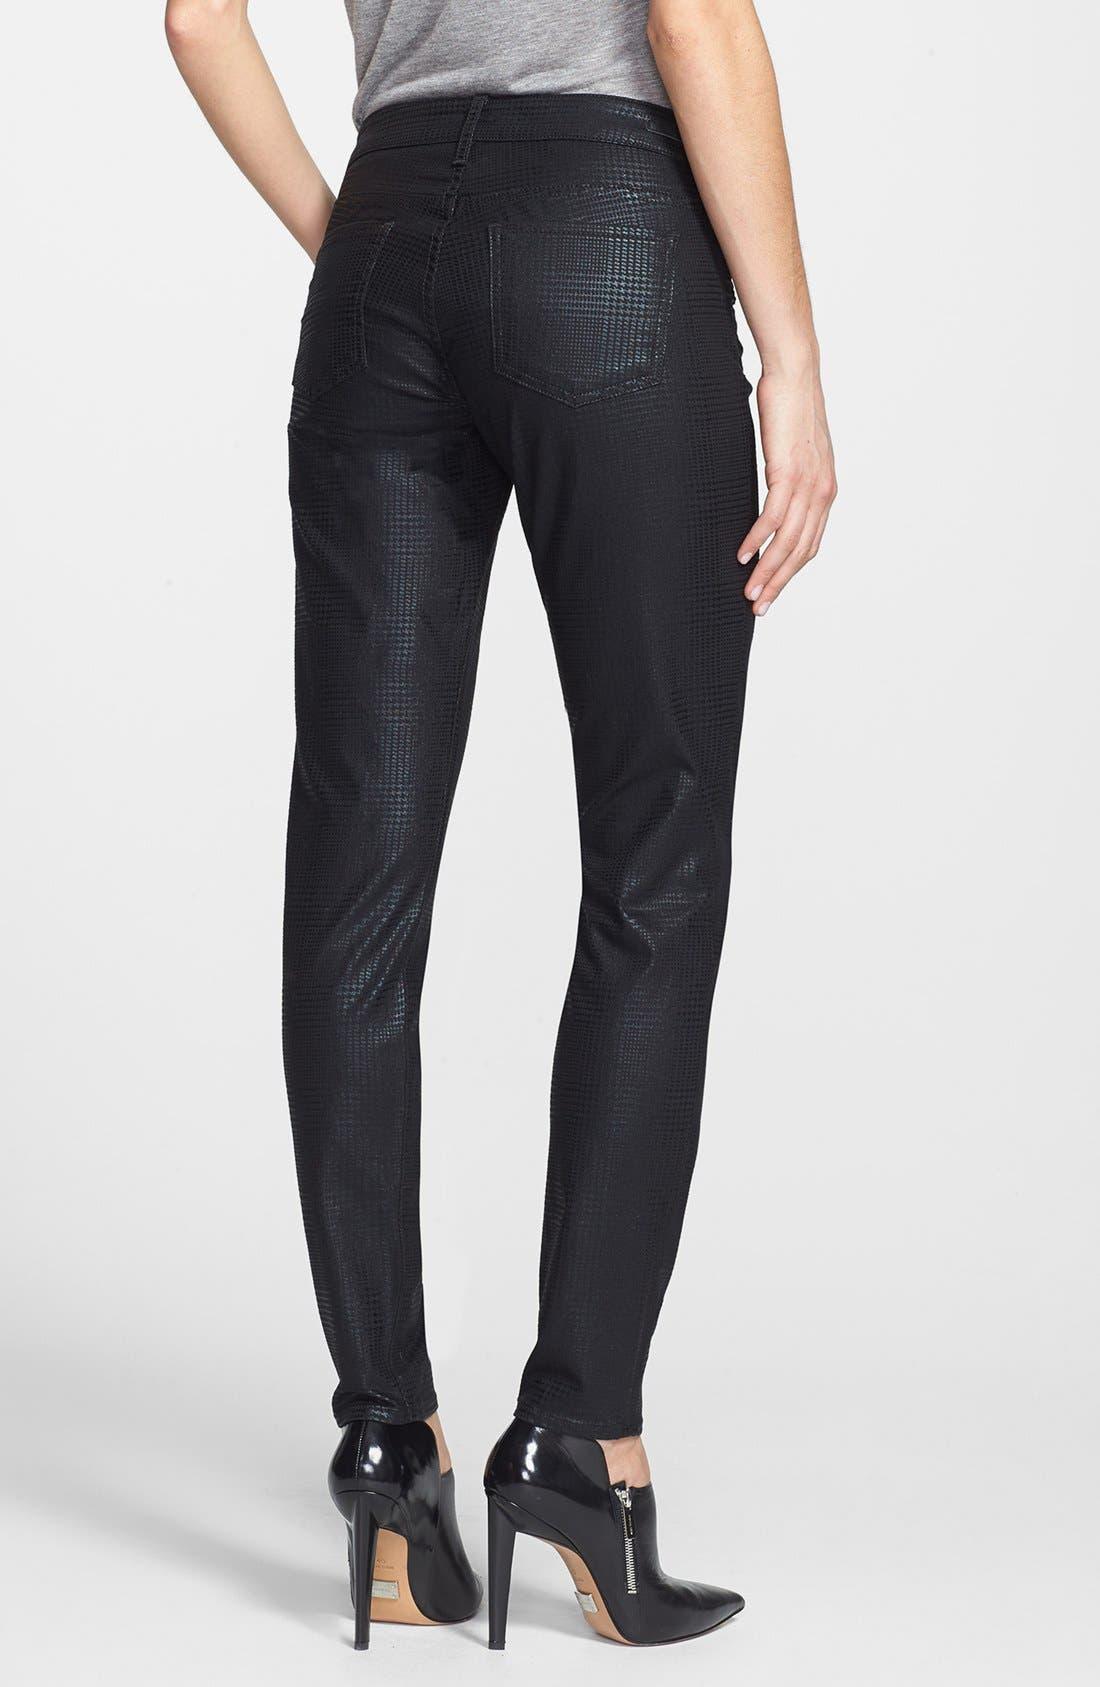 Alternate Image 2  - KUT from the Kloth 'Mia' Toothpick Skinny Jeans (Black)